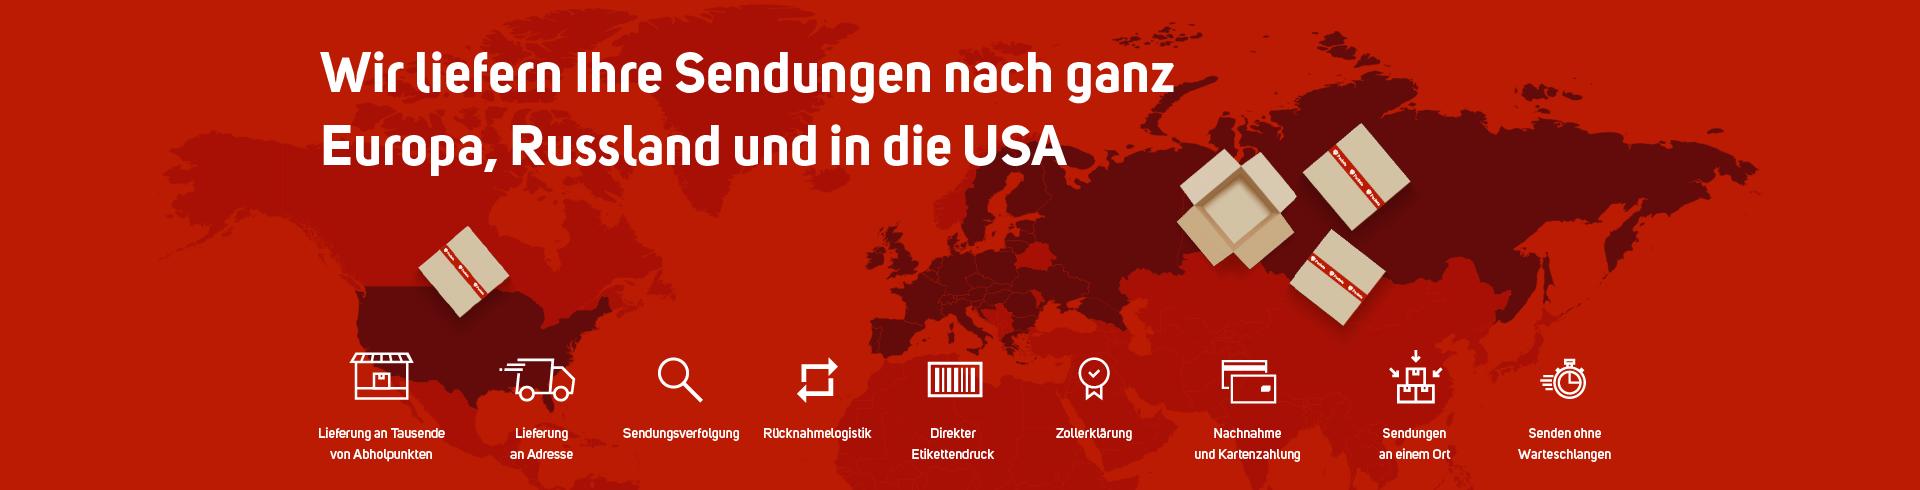 Blog Packeta.de